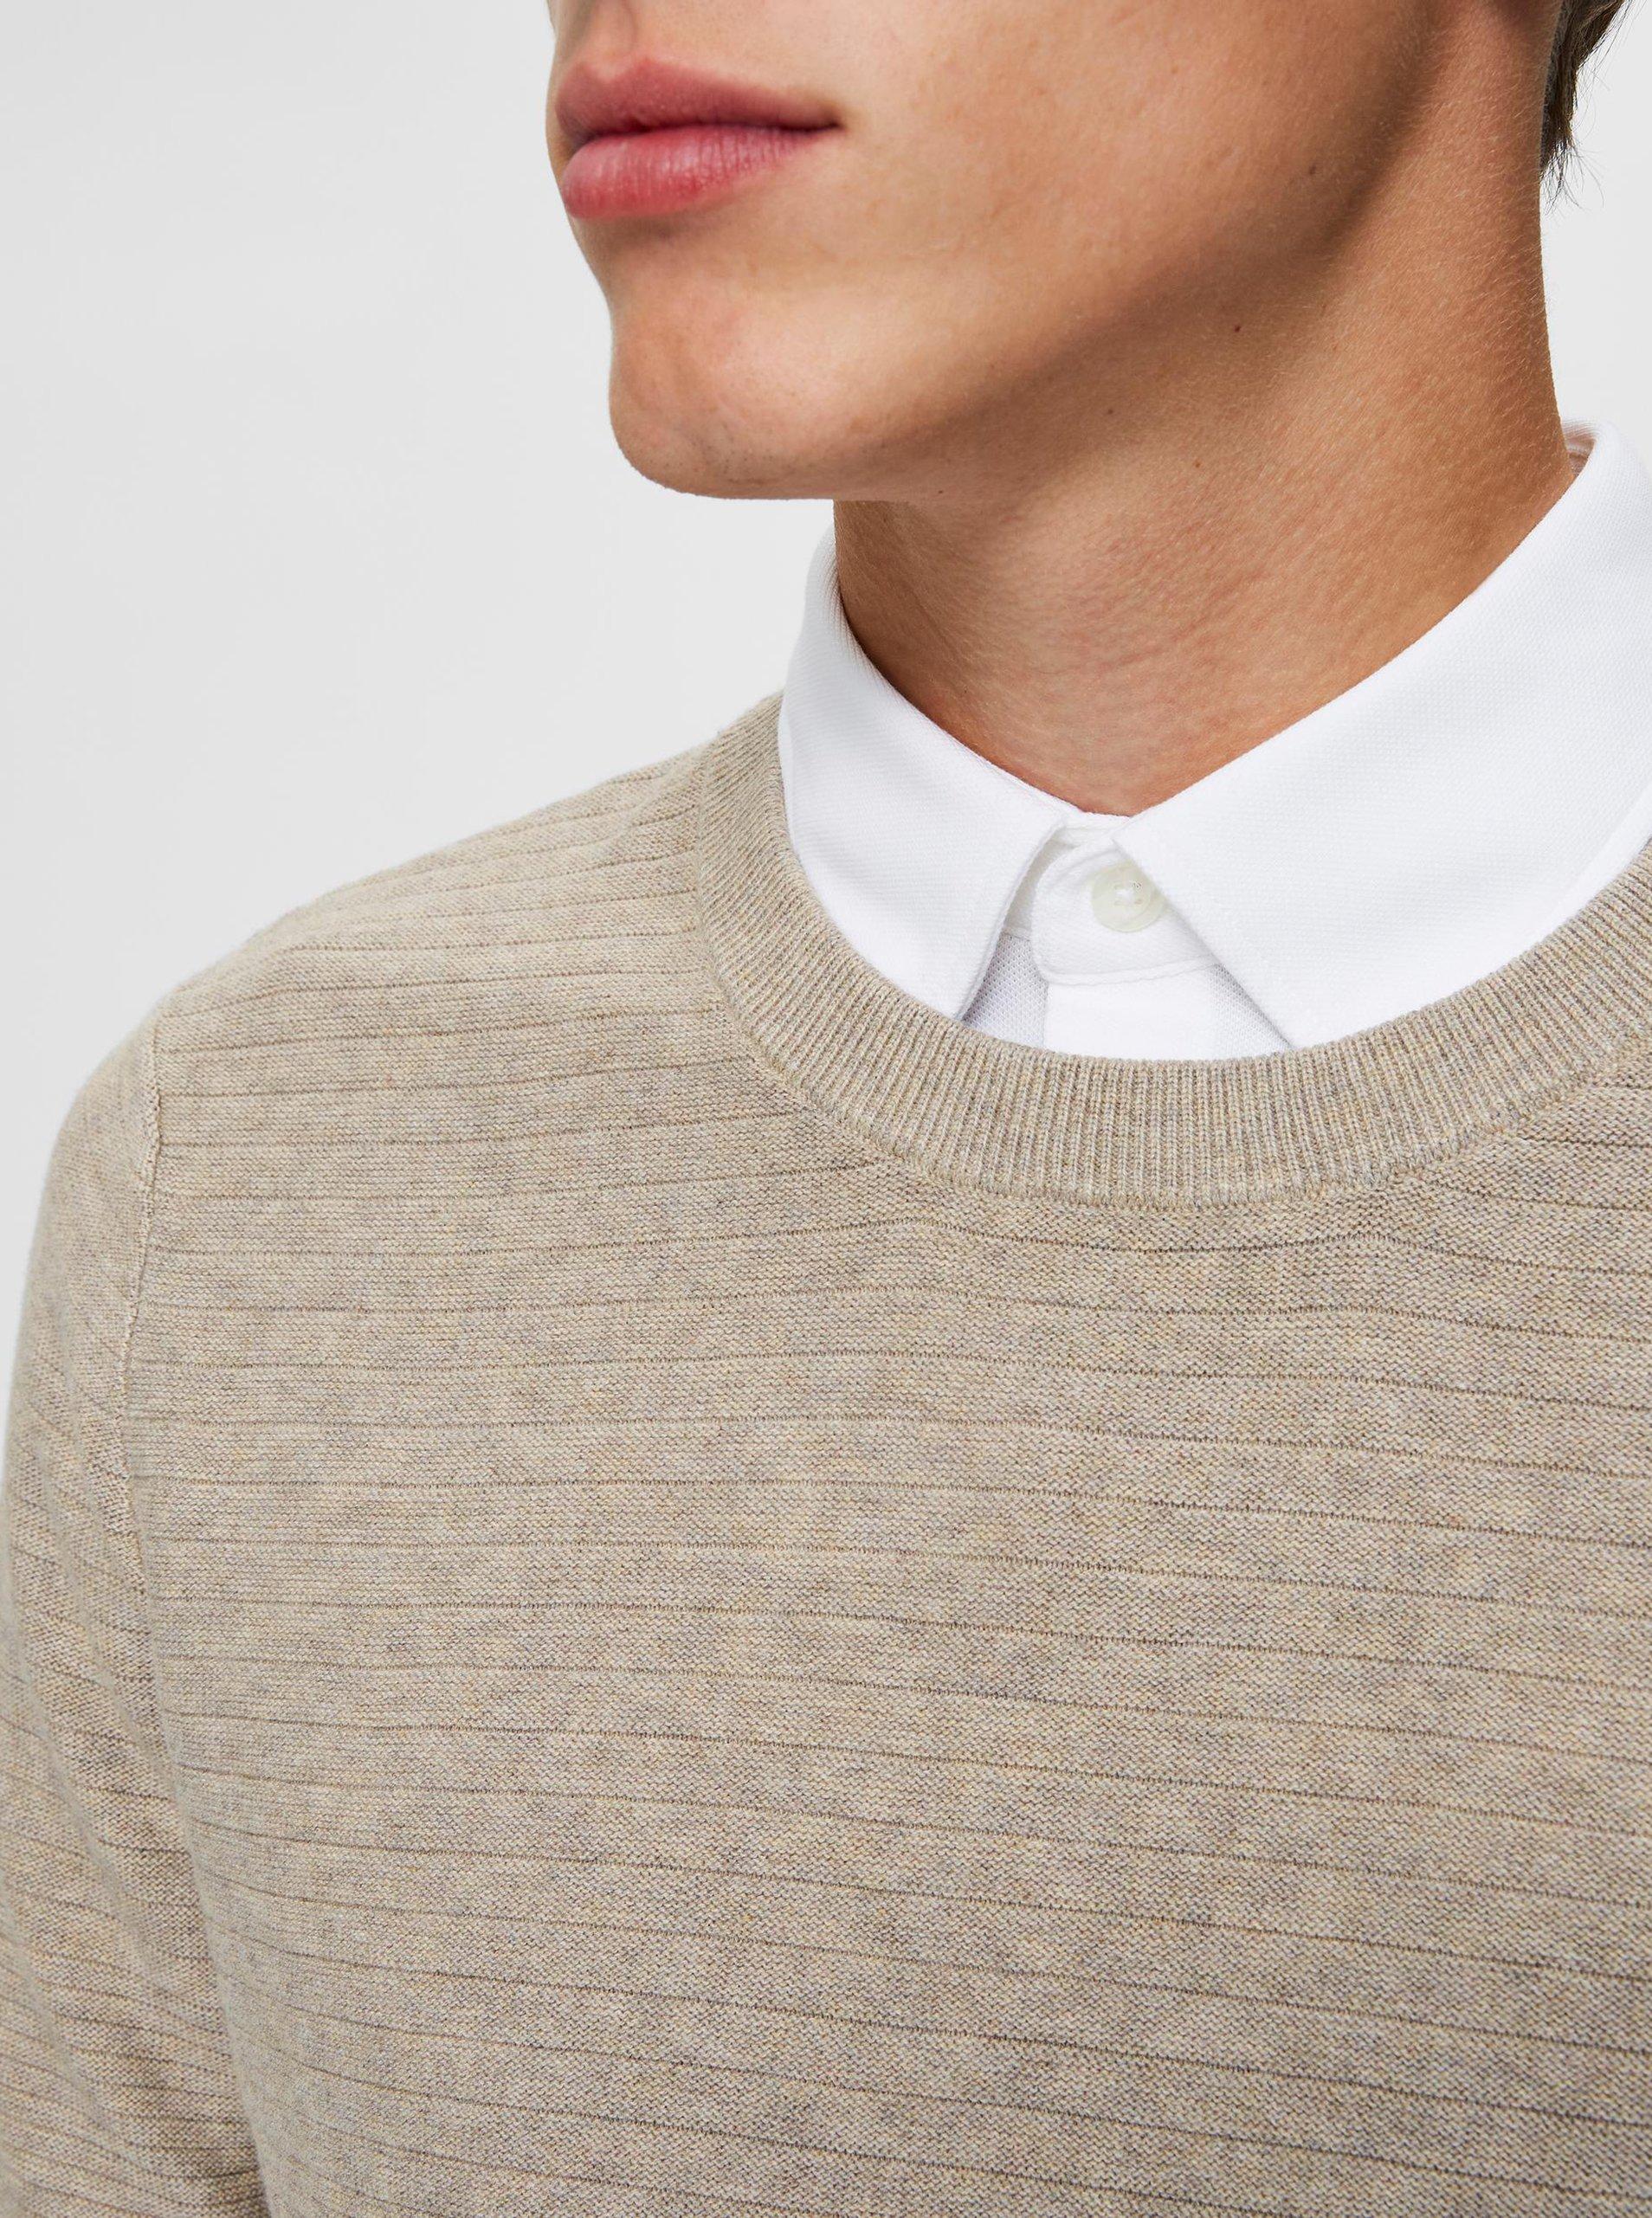 Béžový basic sveter Selected Homme.